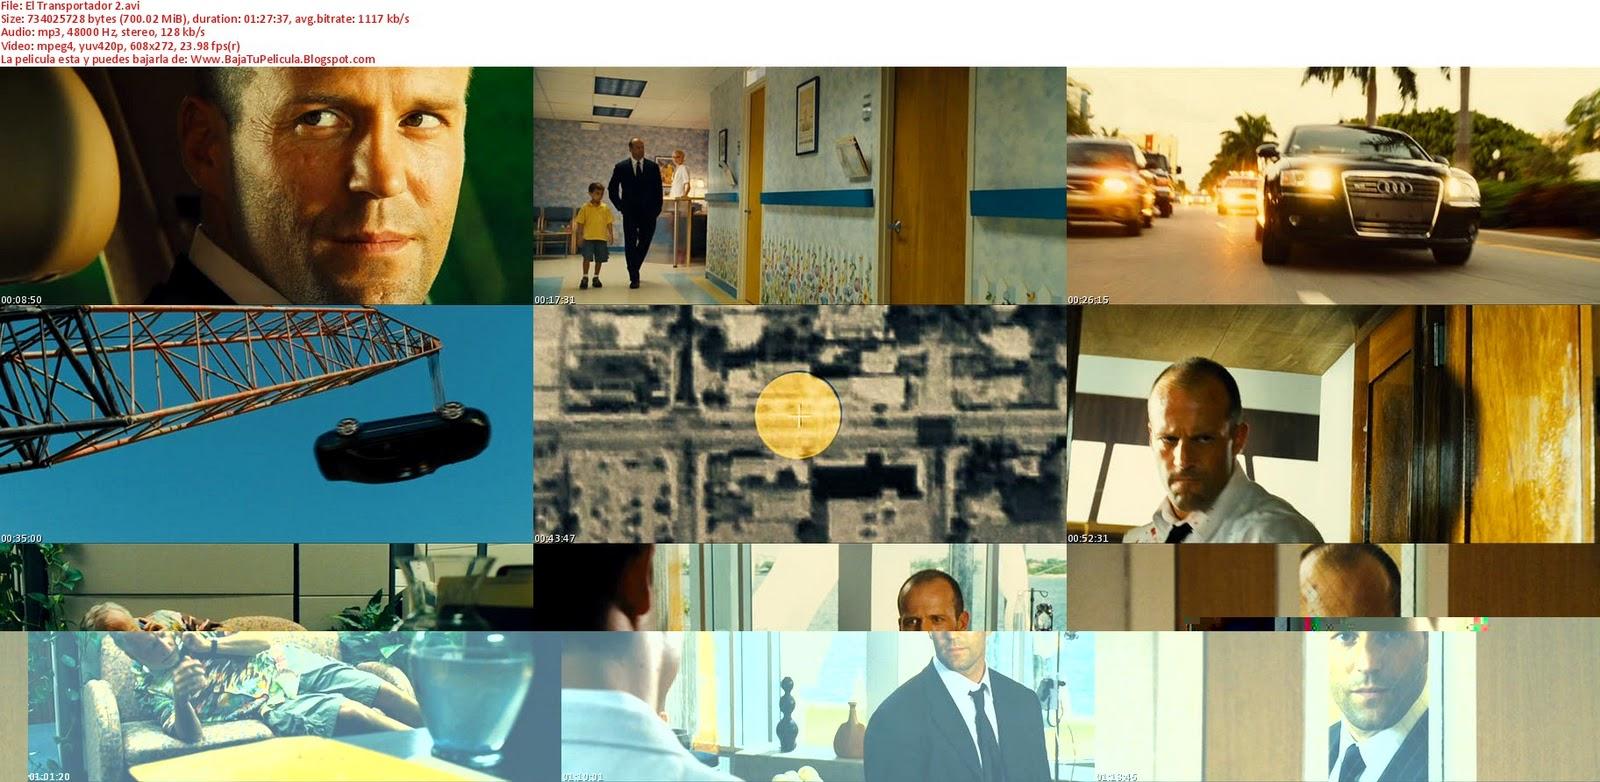 http://3.bp.blogspot.com/-6uxUEjHsgnk/Twkwf-aKIfI/AAAAAAAAATw/PJnlAnVc3bs/s1600/El+Transportador+2_s.jpg